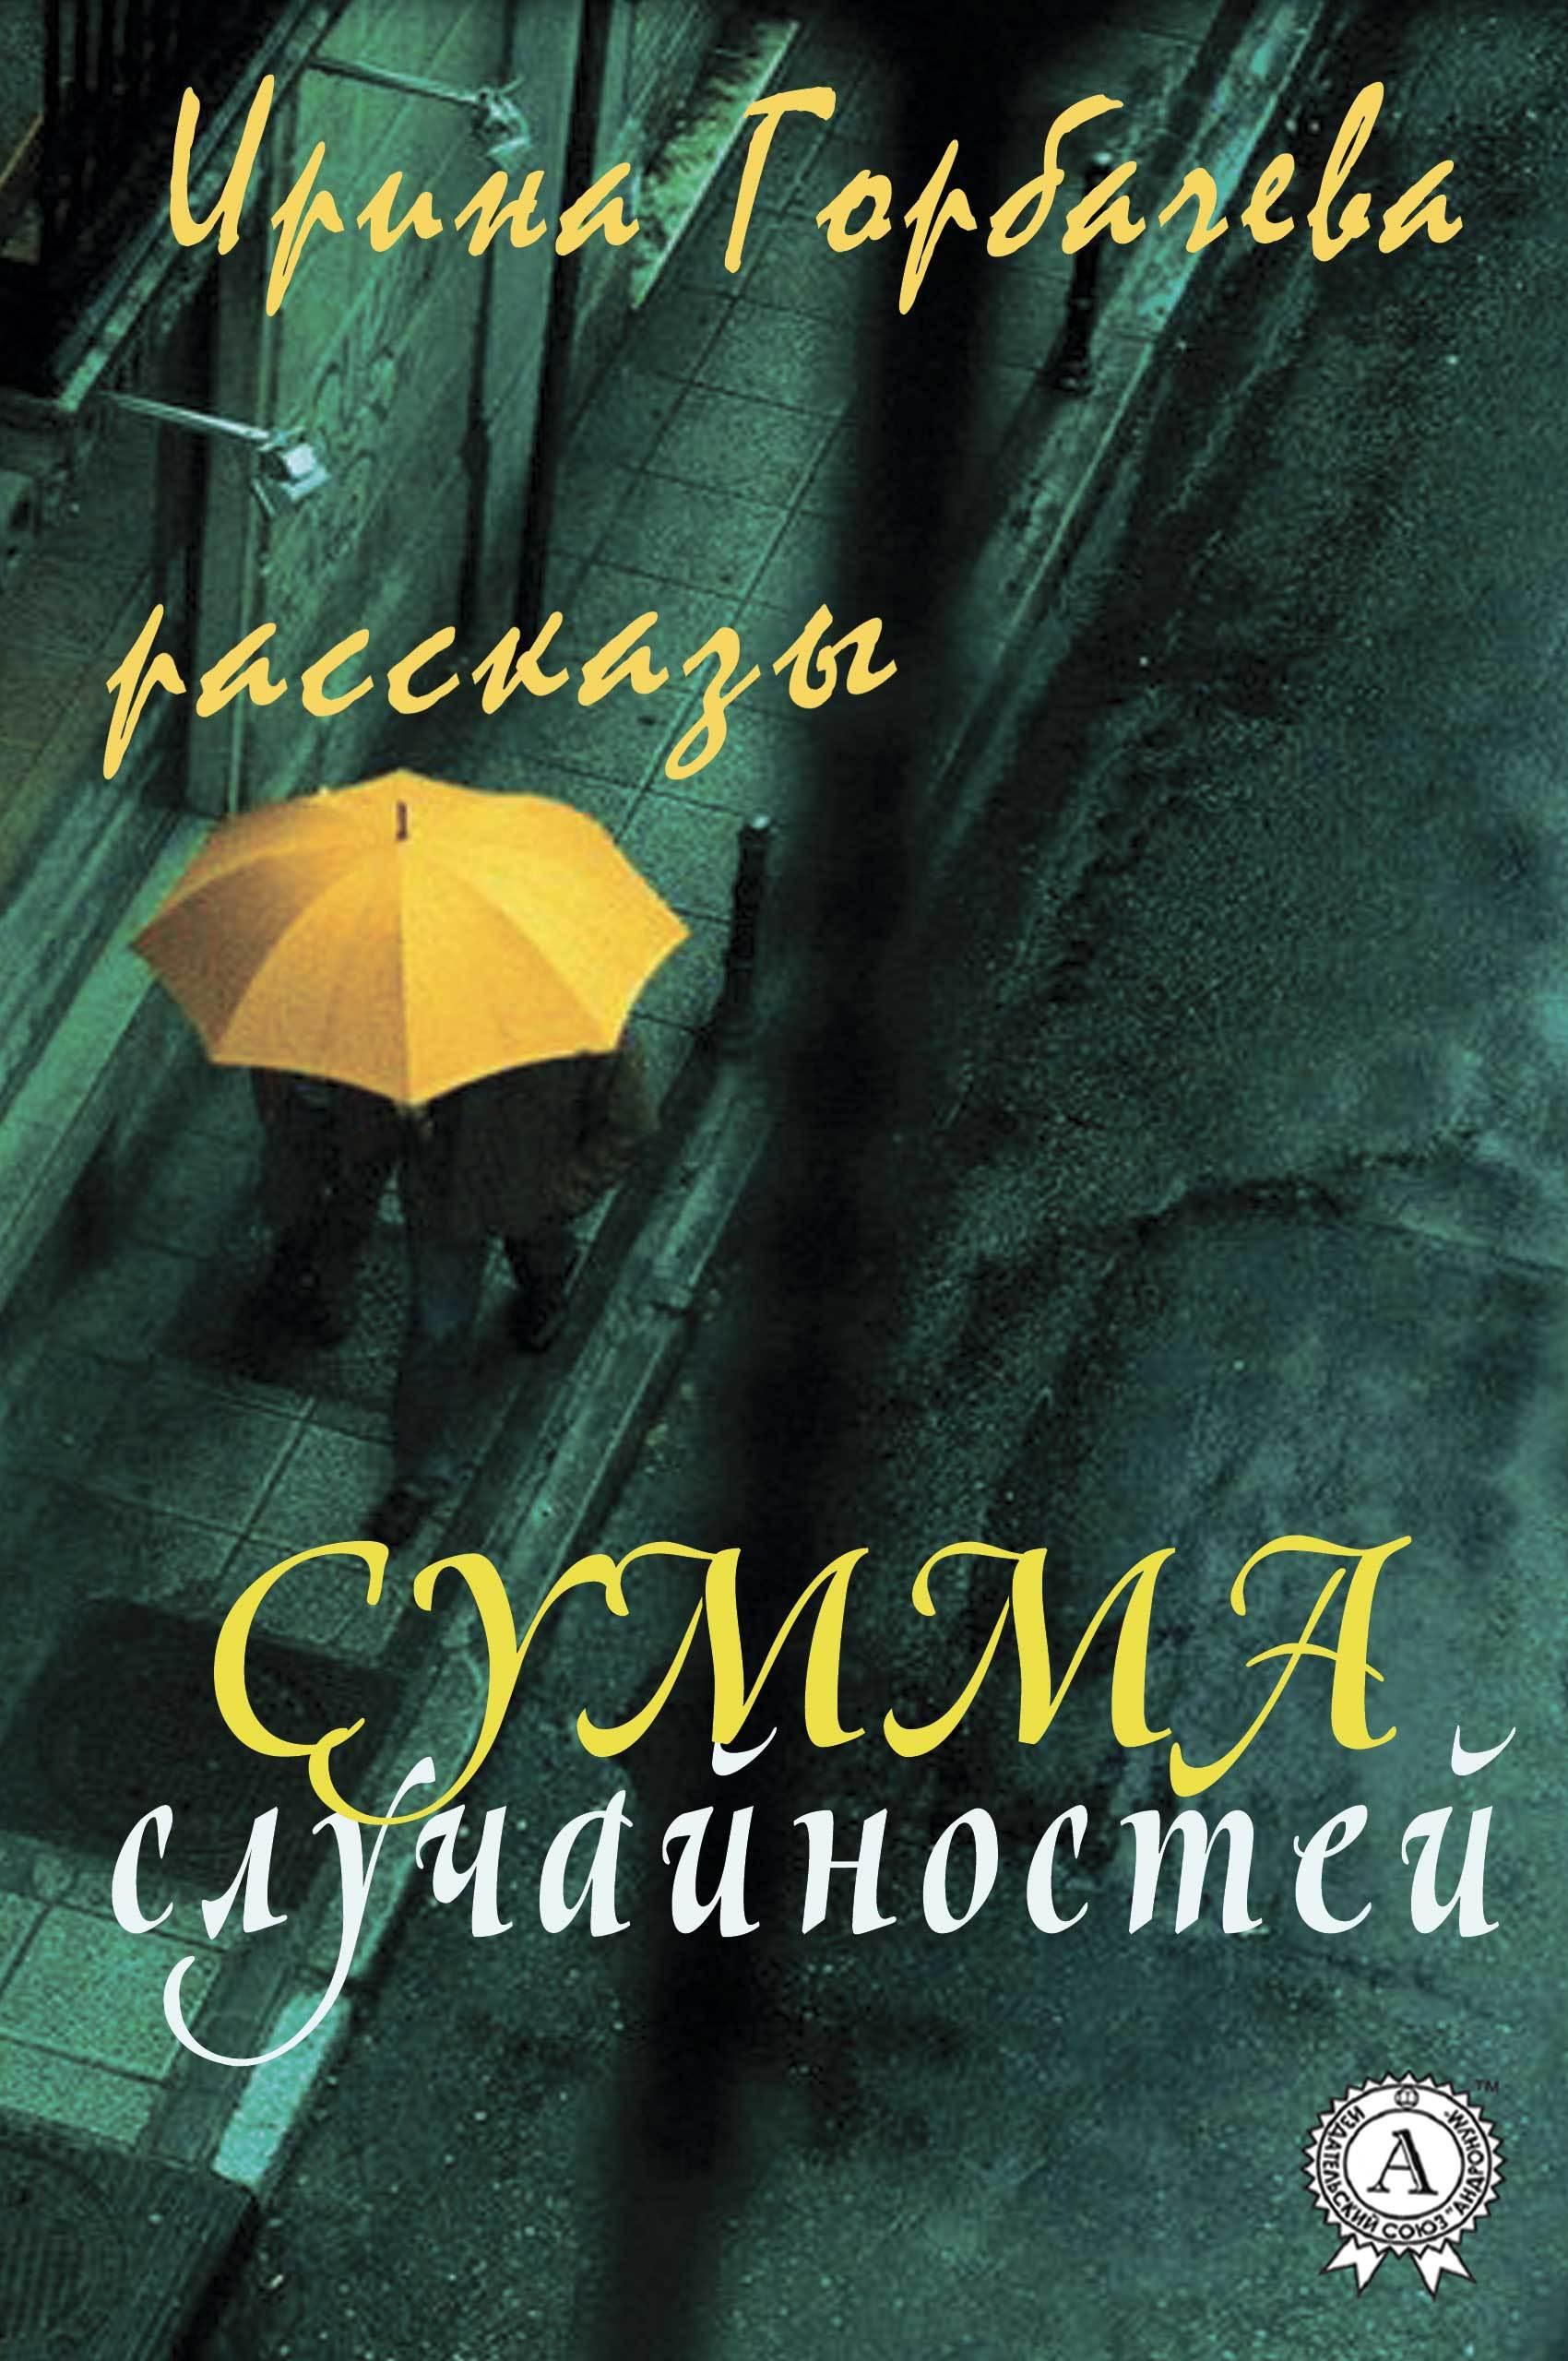 Ирина Горбачева Сумма случайностей (рассказы) ирина горбачева сумма случайностей рассказы